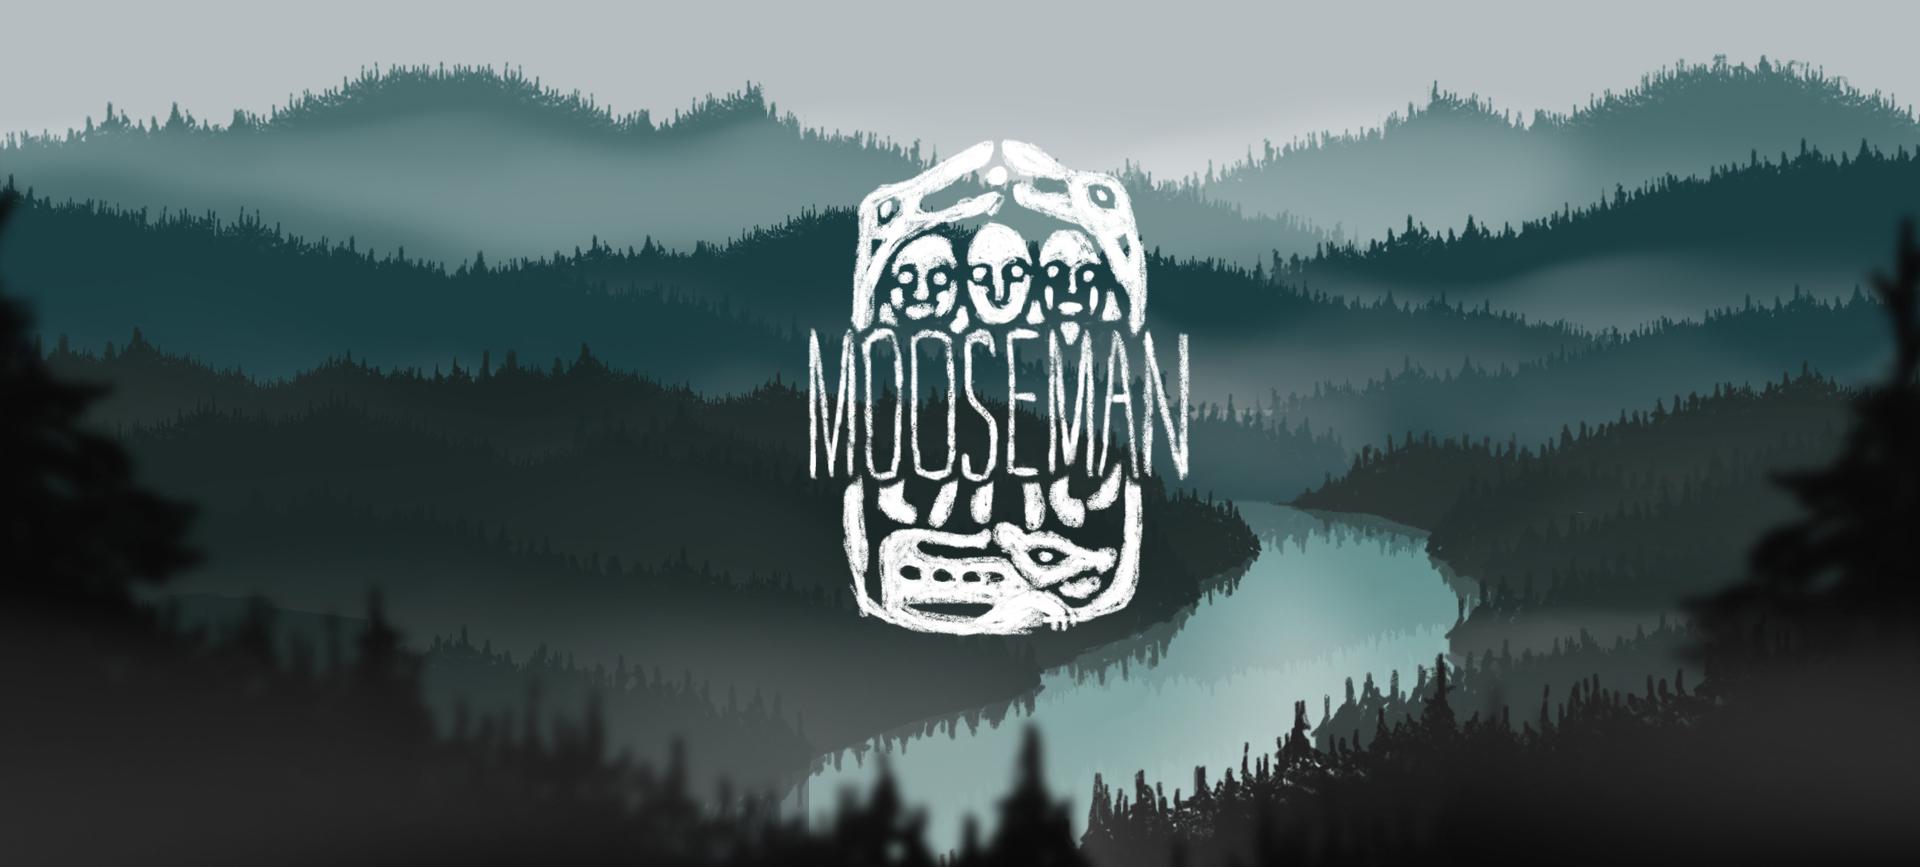 The Mooseman  (Demo)